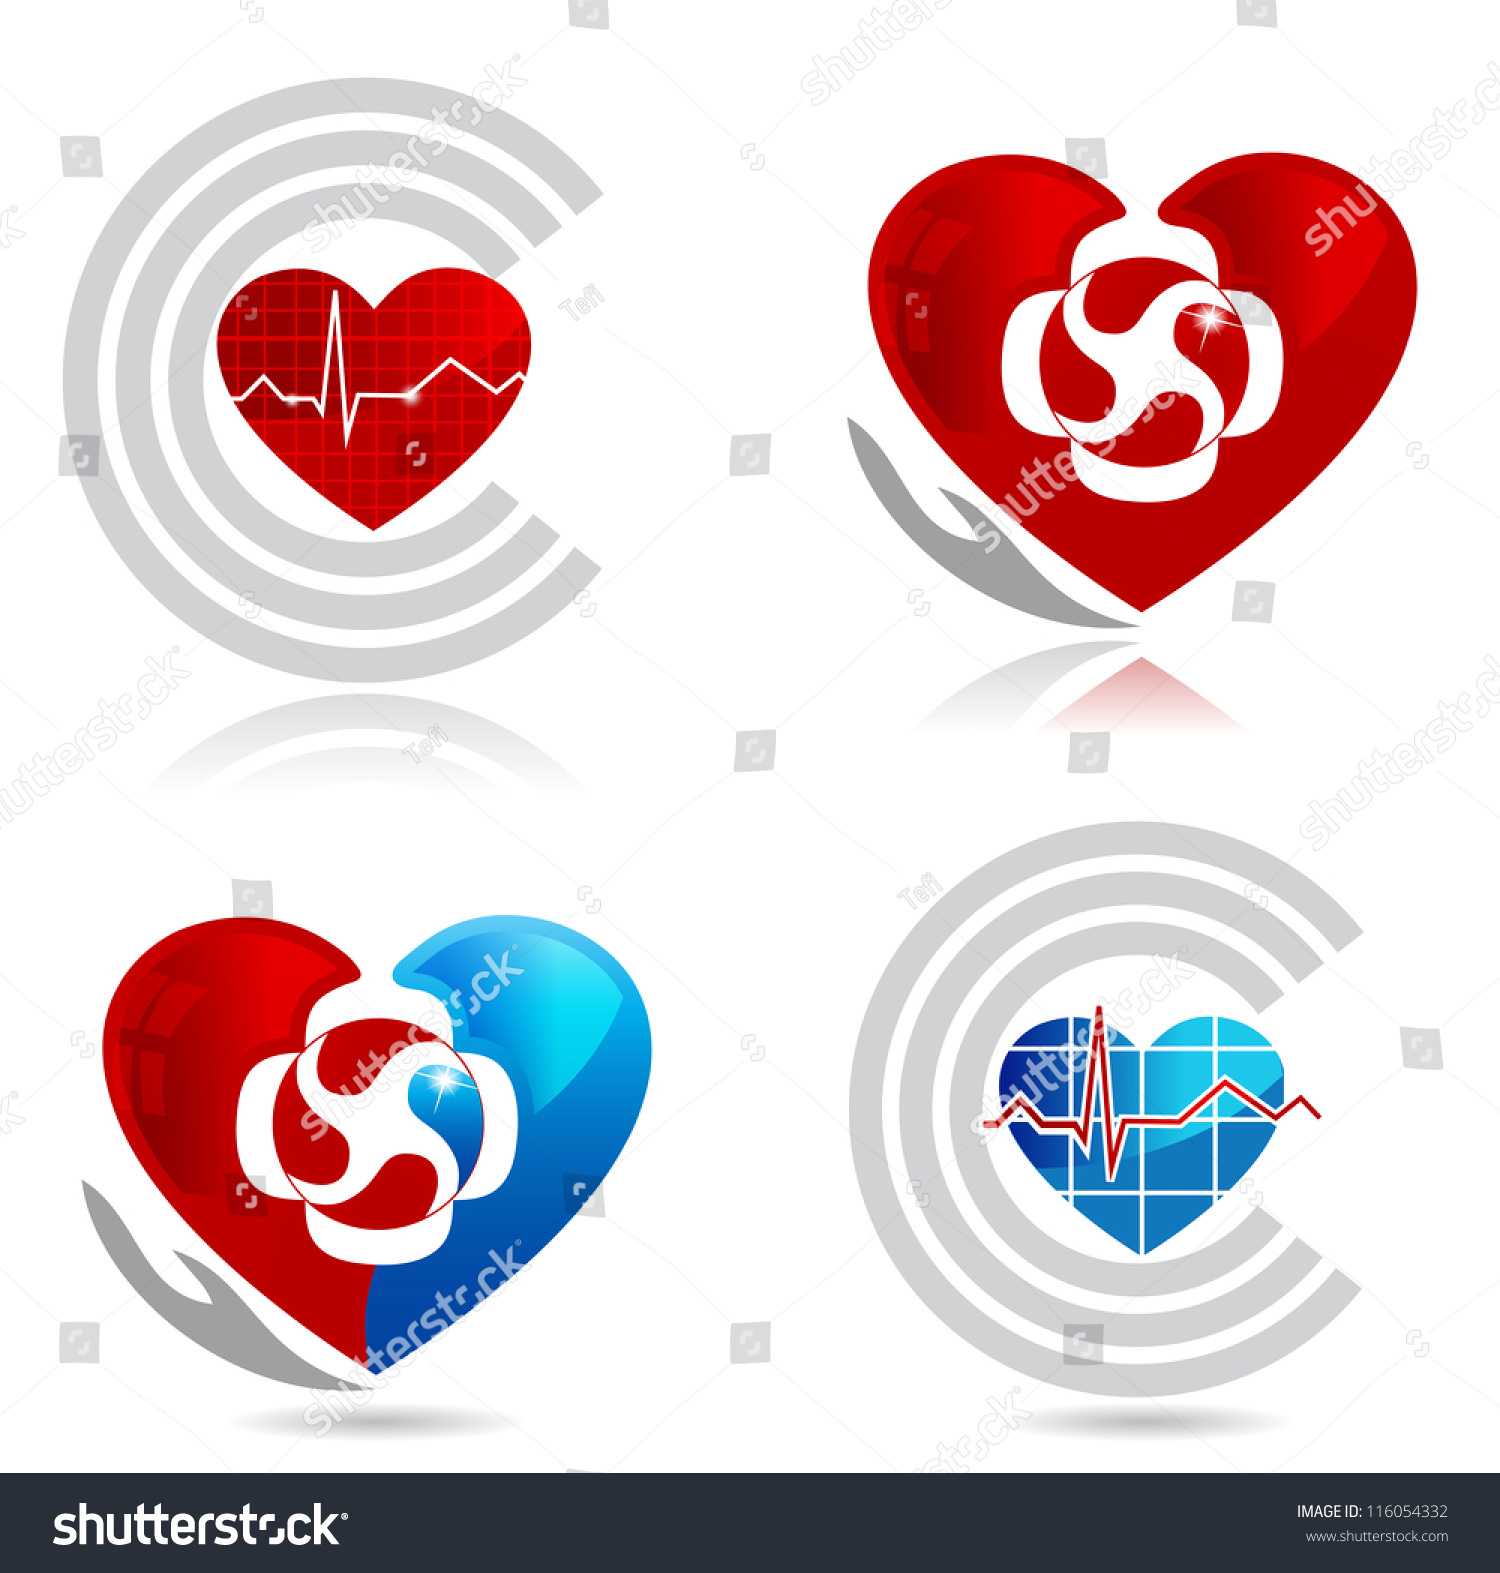 Cardiology medical healthy heart symbols heart stock vector cardiology medical and healthy heart symbols the heart symbolizes blood circulation in the heart biocorpaavc Choice Image